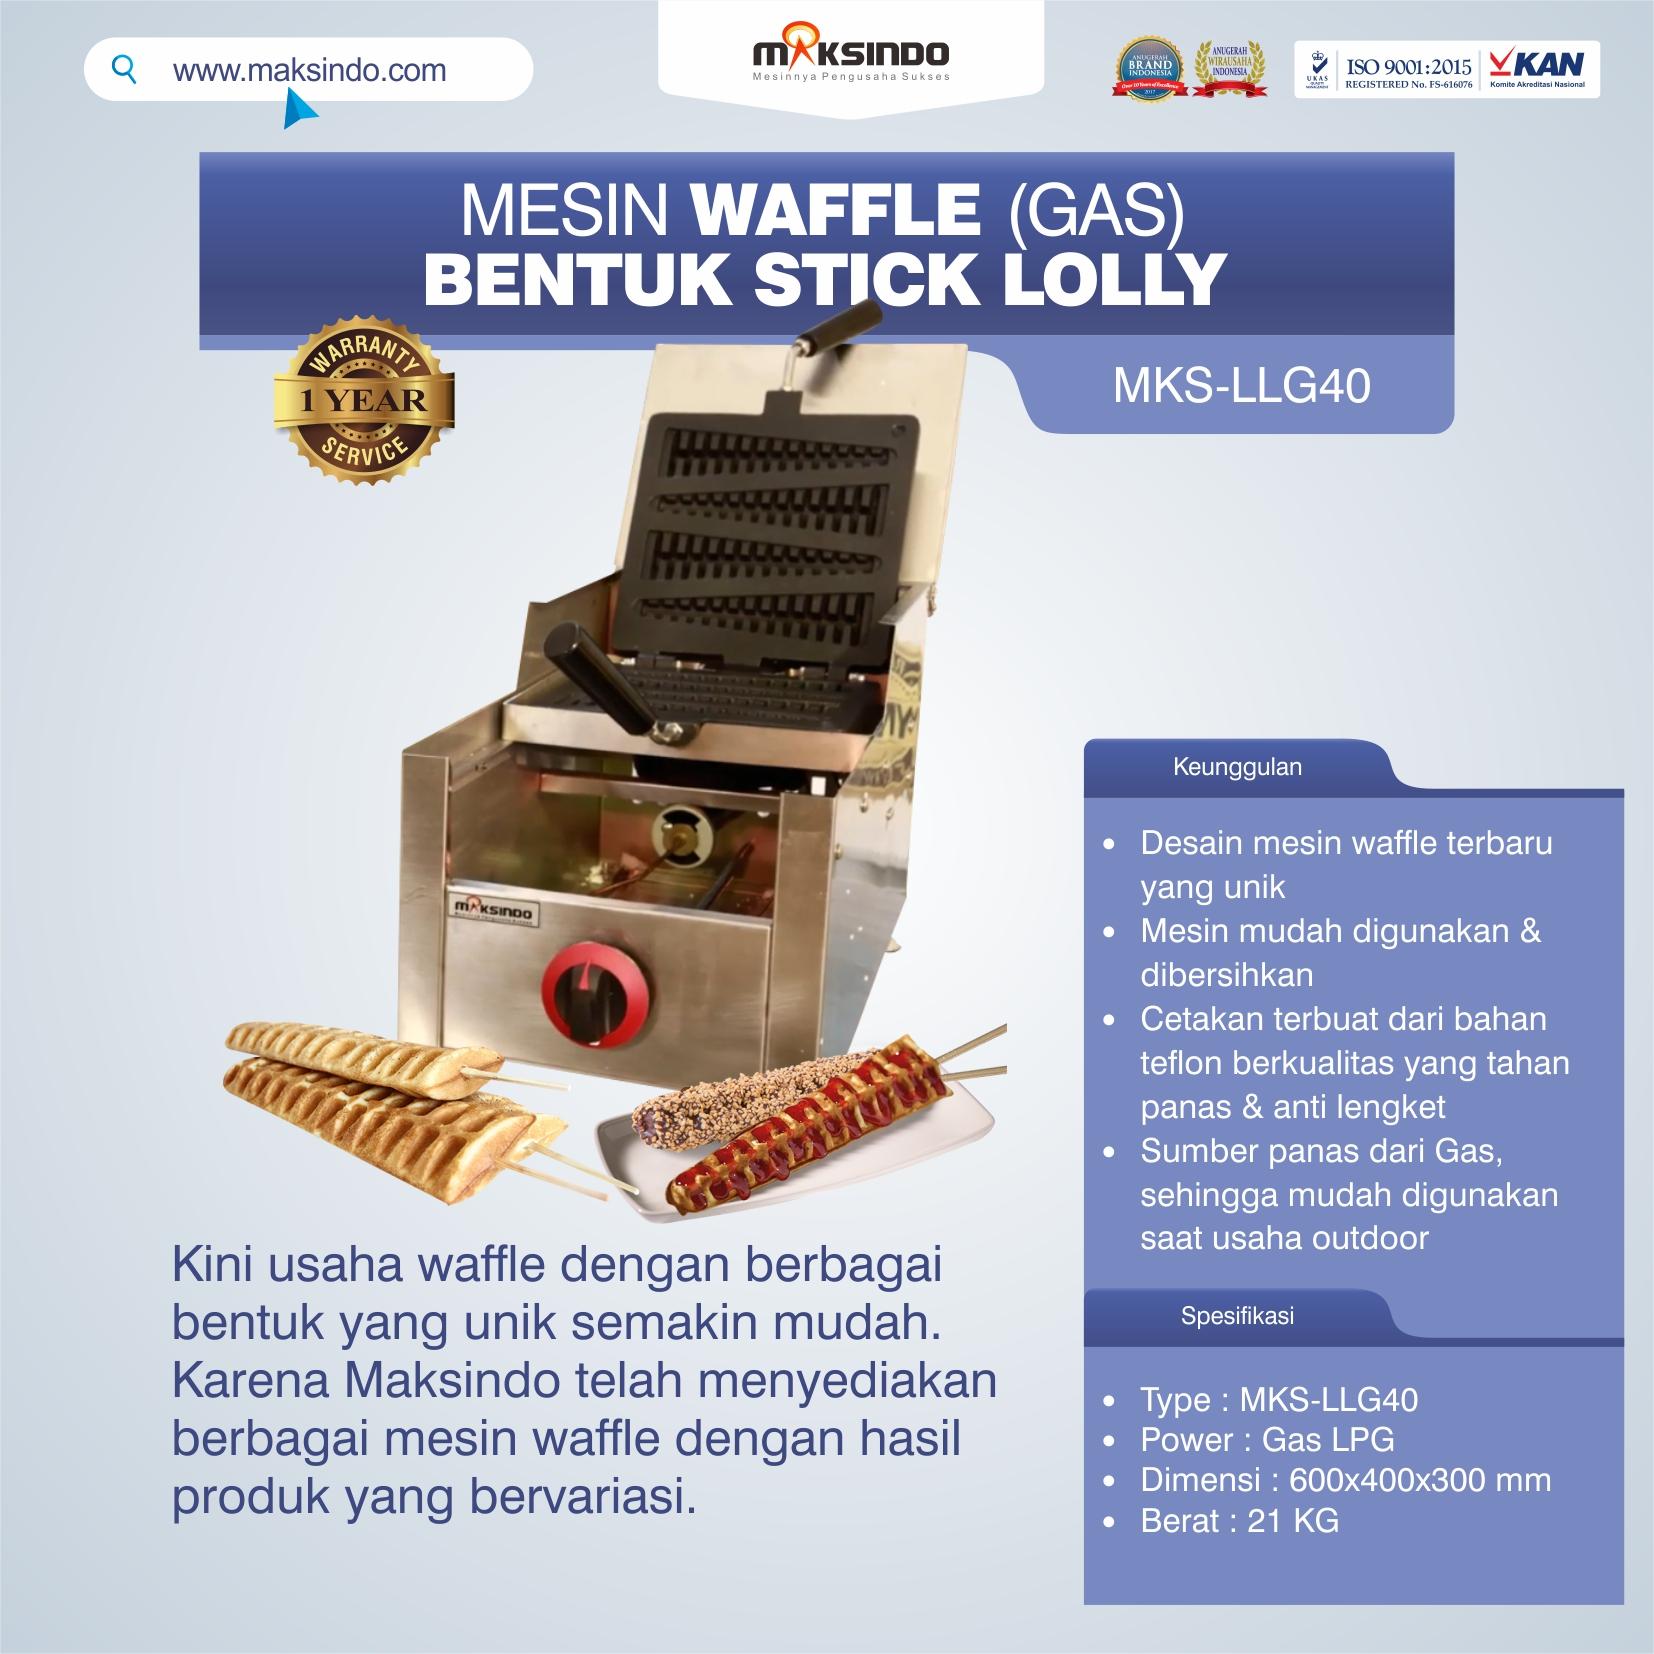 Jual Mesin Waffle Bentuk Stick Lolly (Gas) MKS-LLG40 di Medan